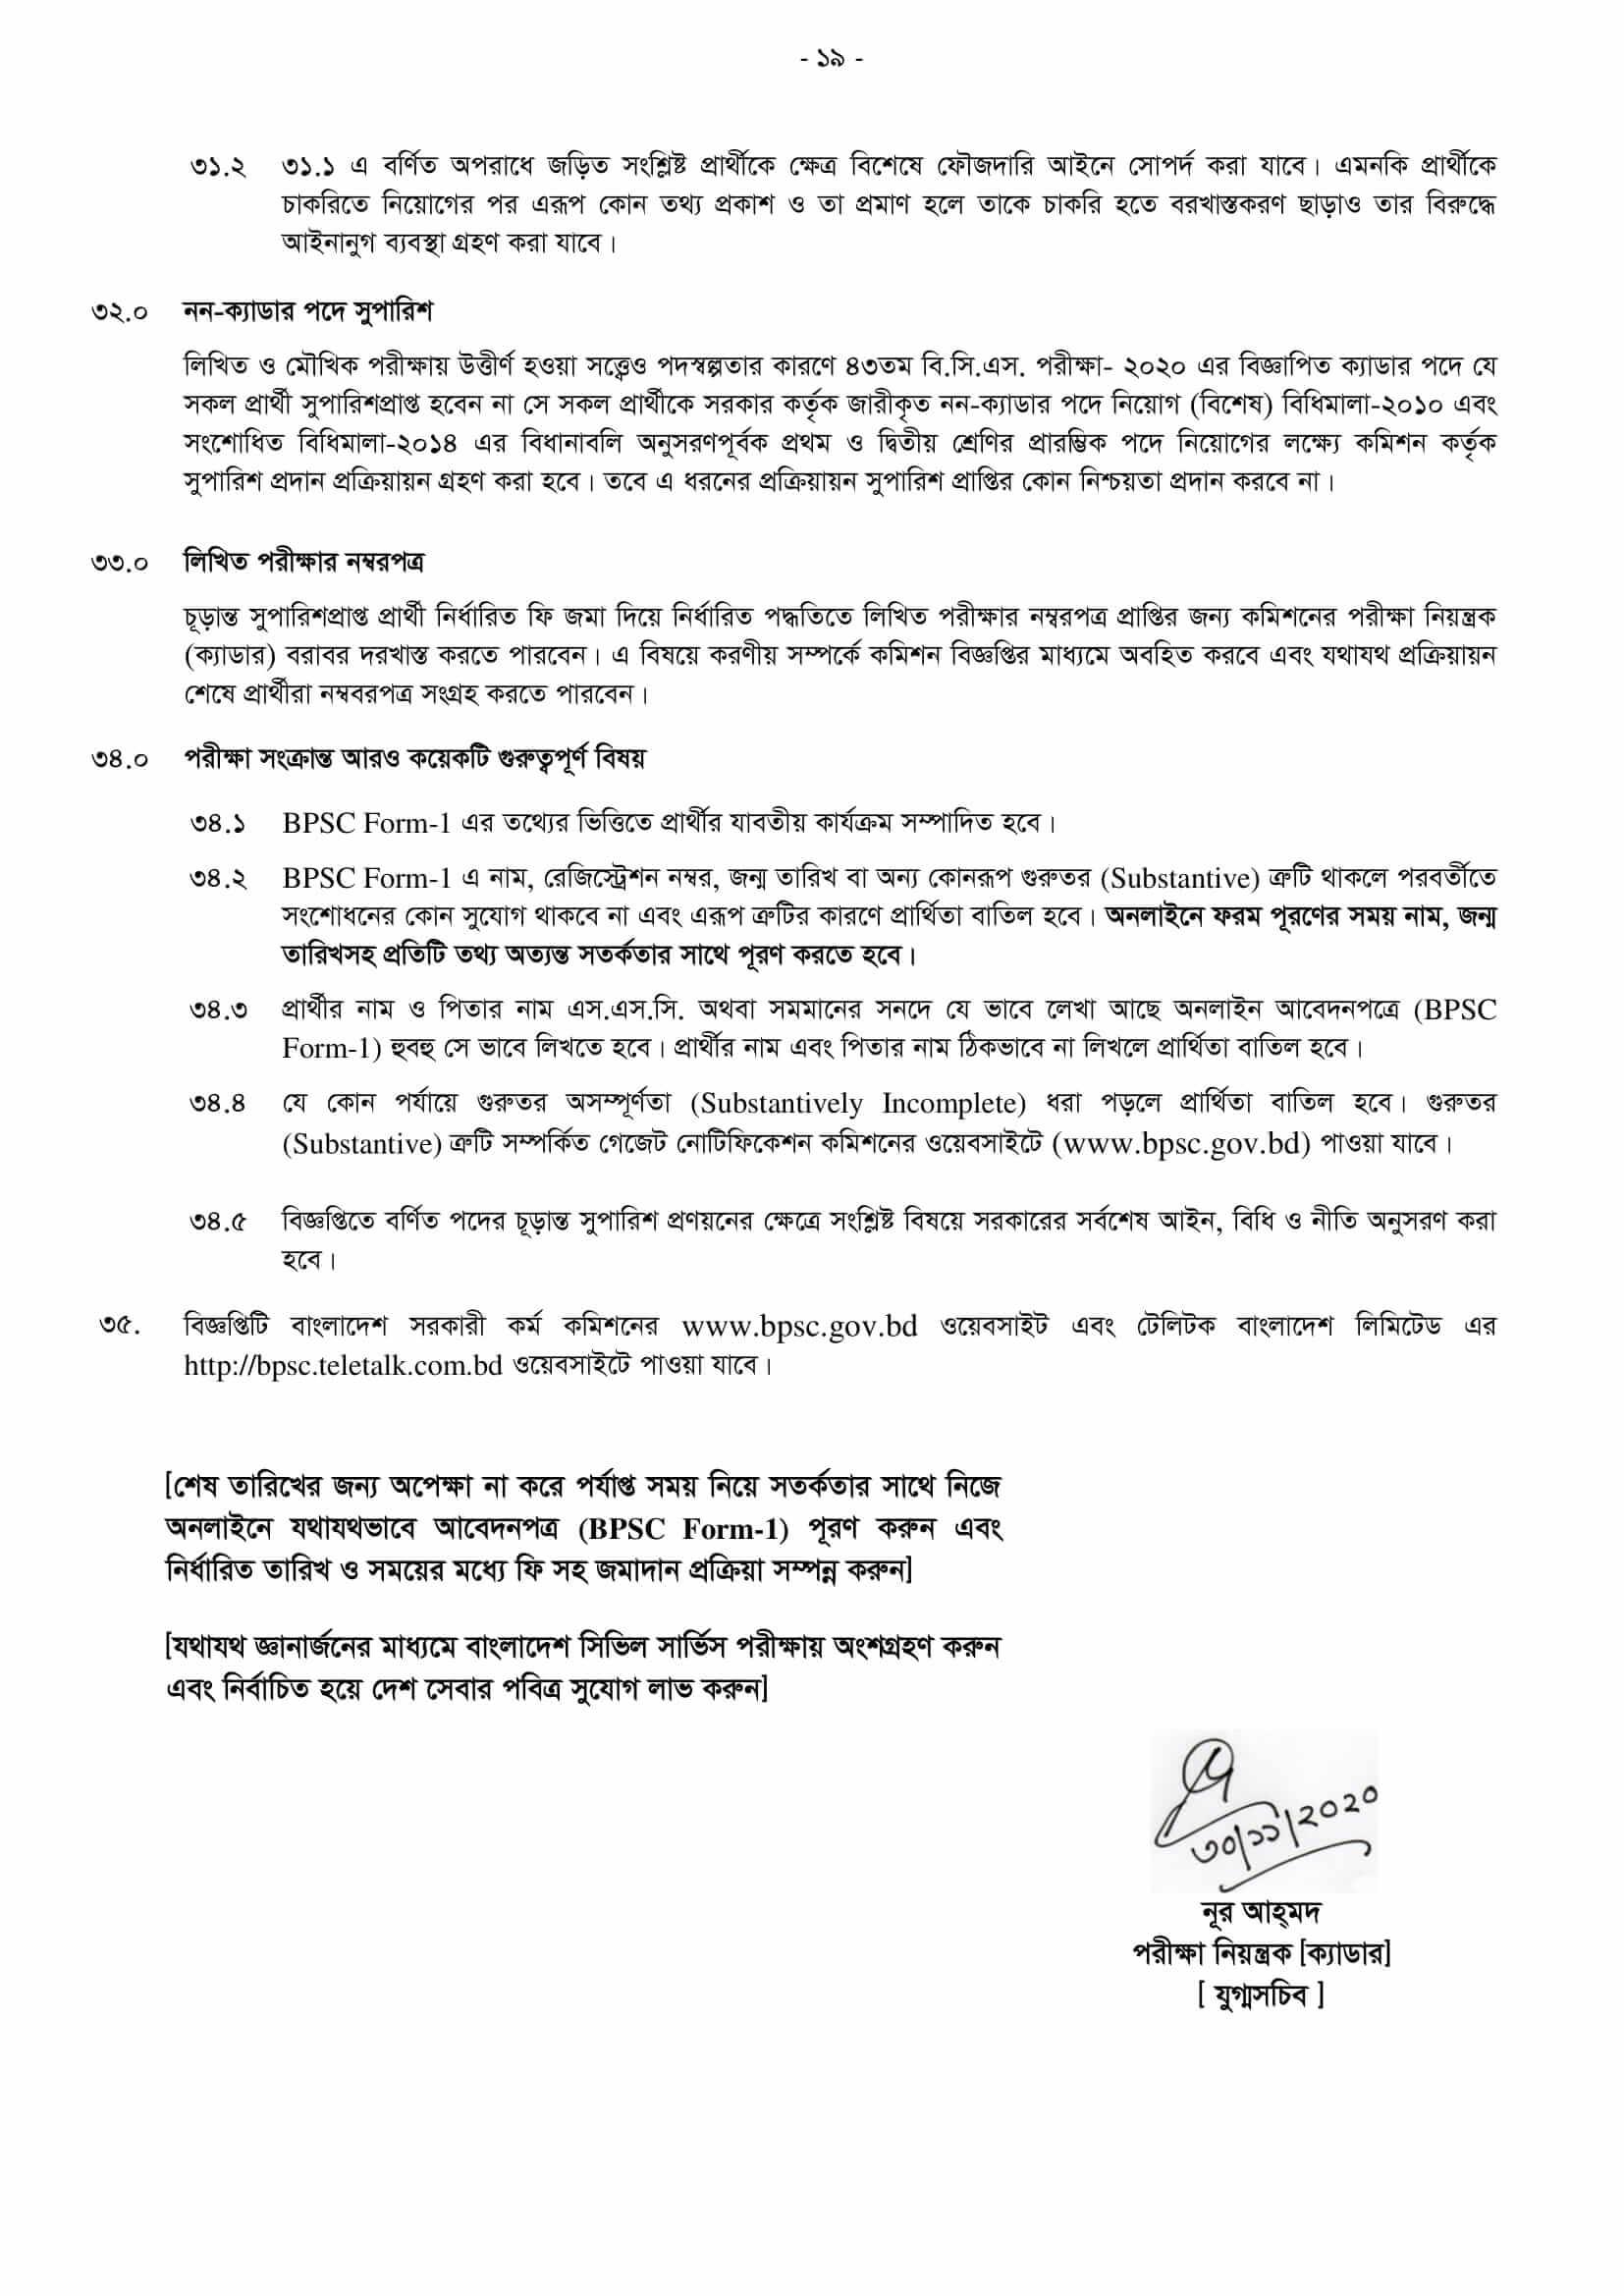 Bangladesh Public Service Commission Circular 2020